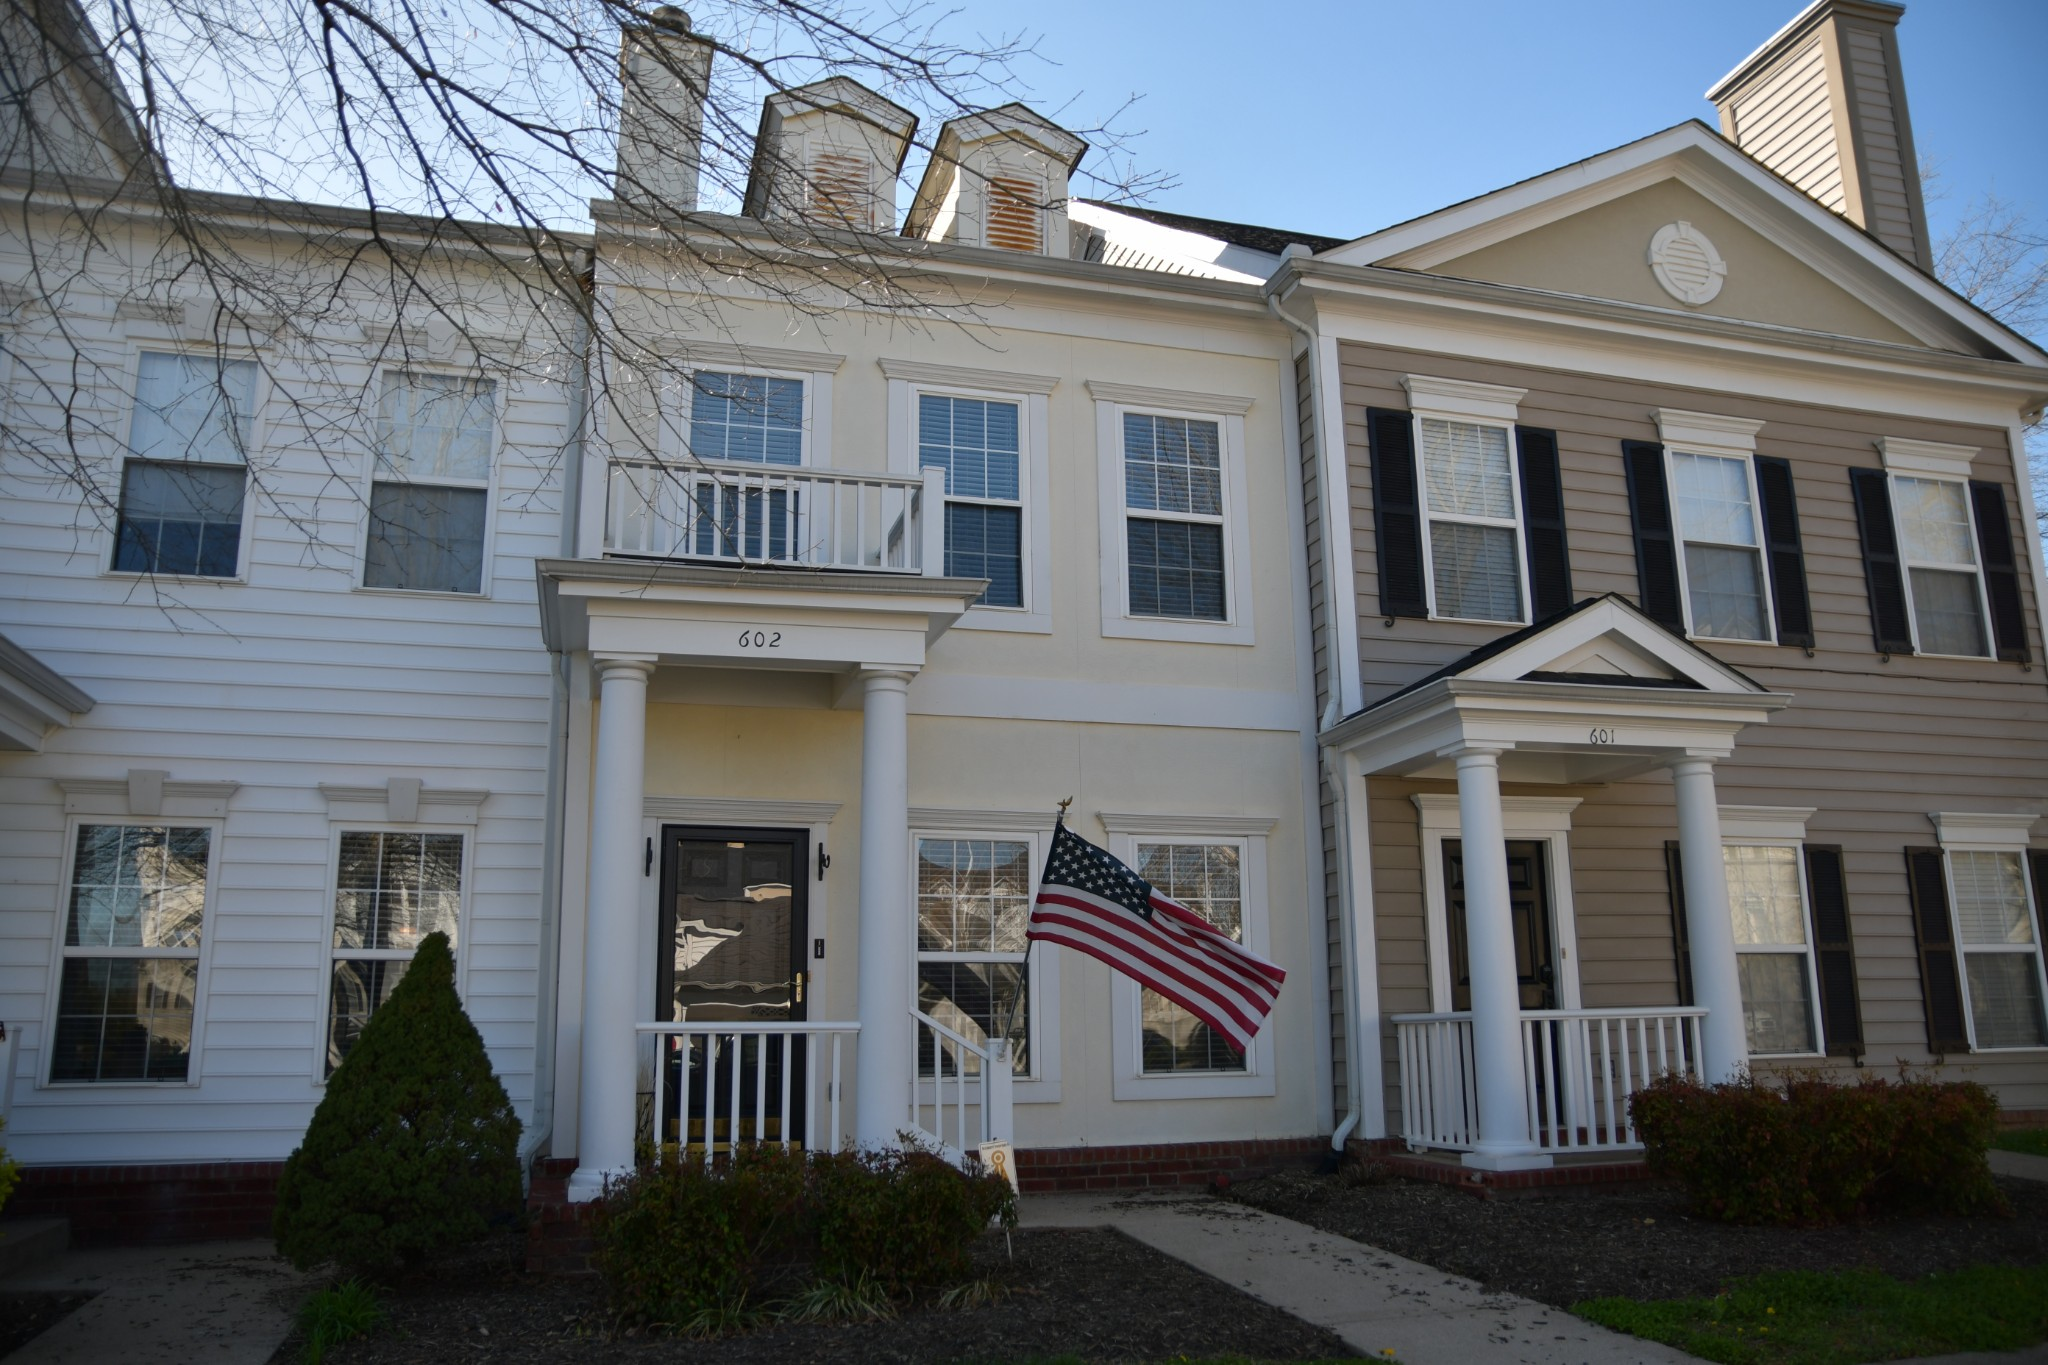 4316 Summercrest Blvd #602 Property Photo - Antioch, TN real estate listing